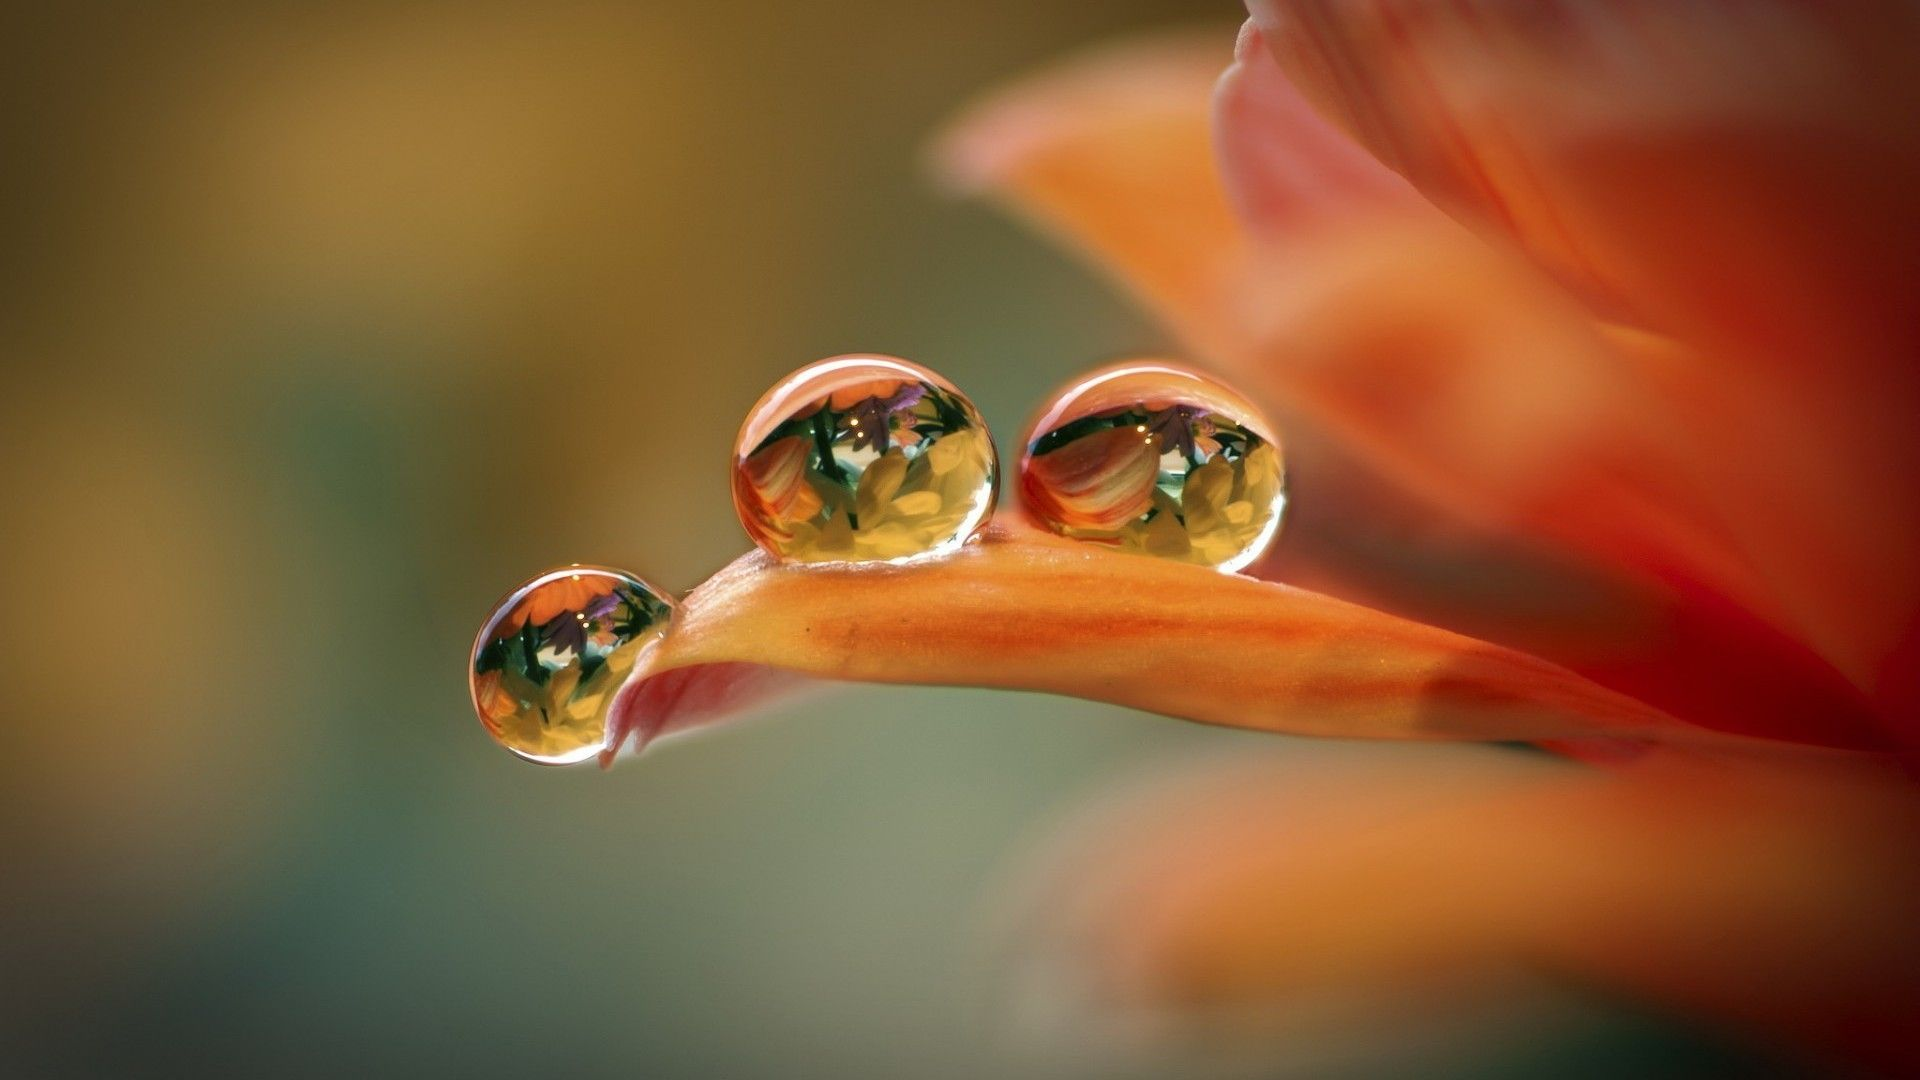 خلفيات جميلة للكمبيوتر Hd 2018 Wallpapers Tecnologis Nature Water No Rain No Flowers Water Drops